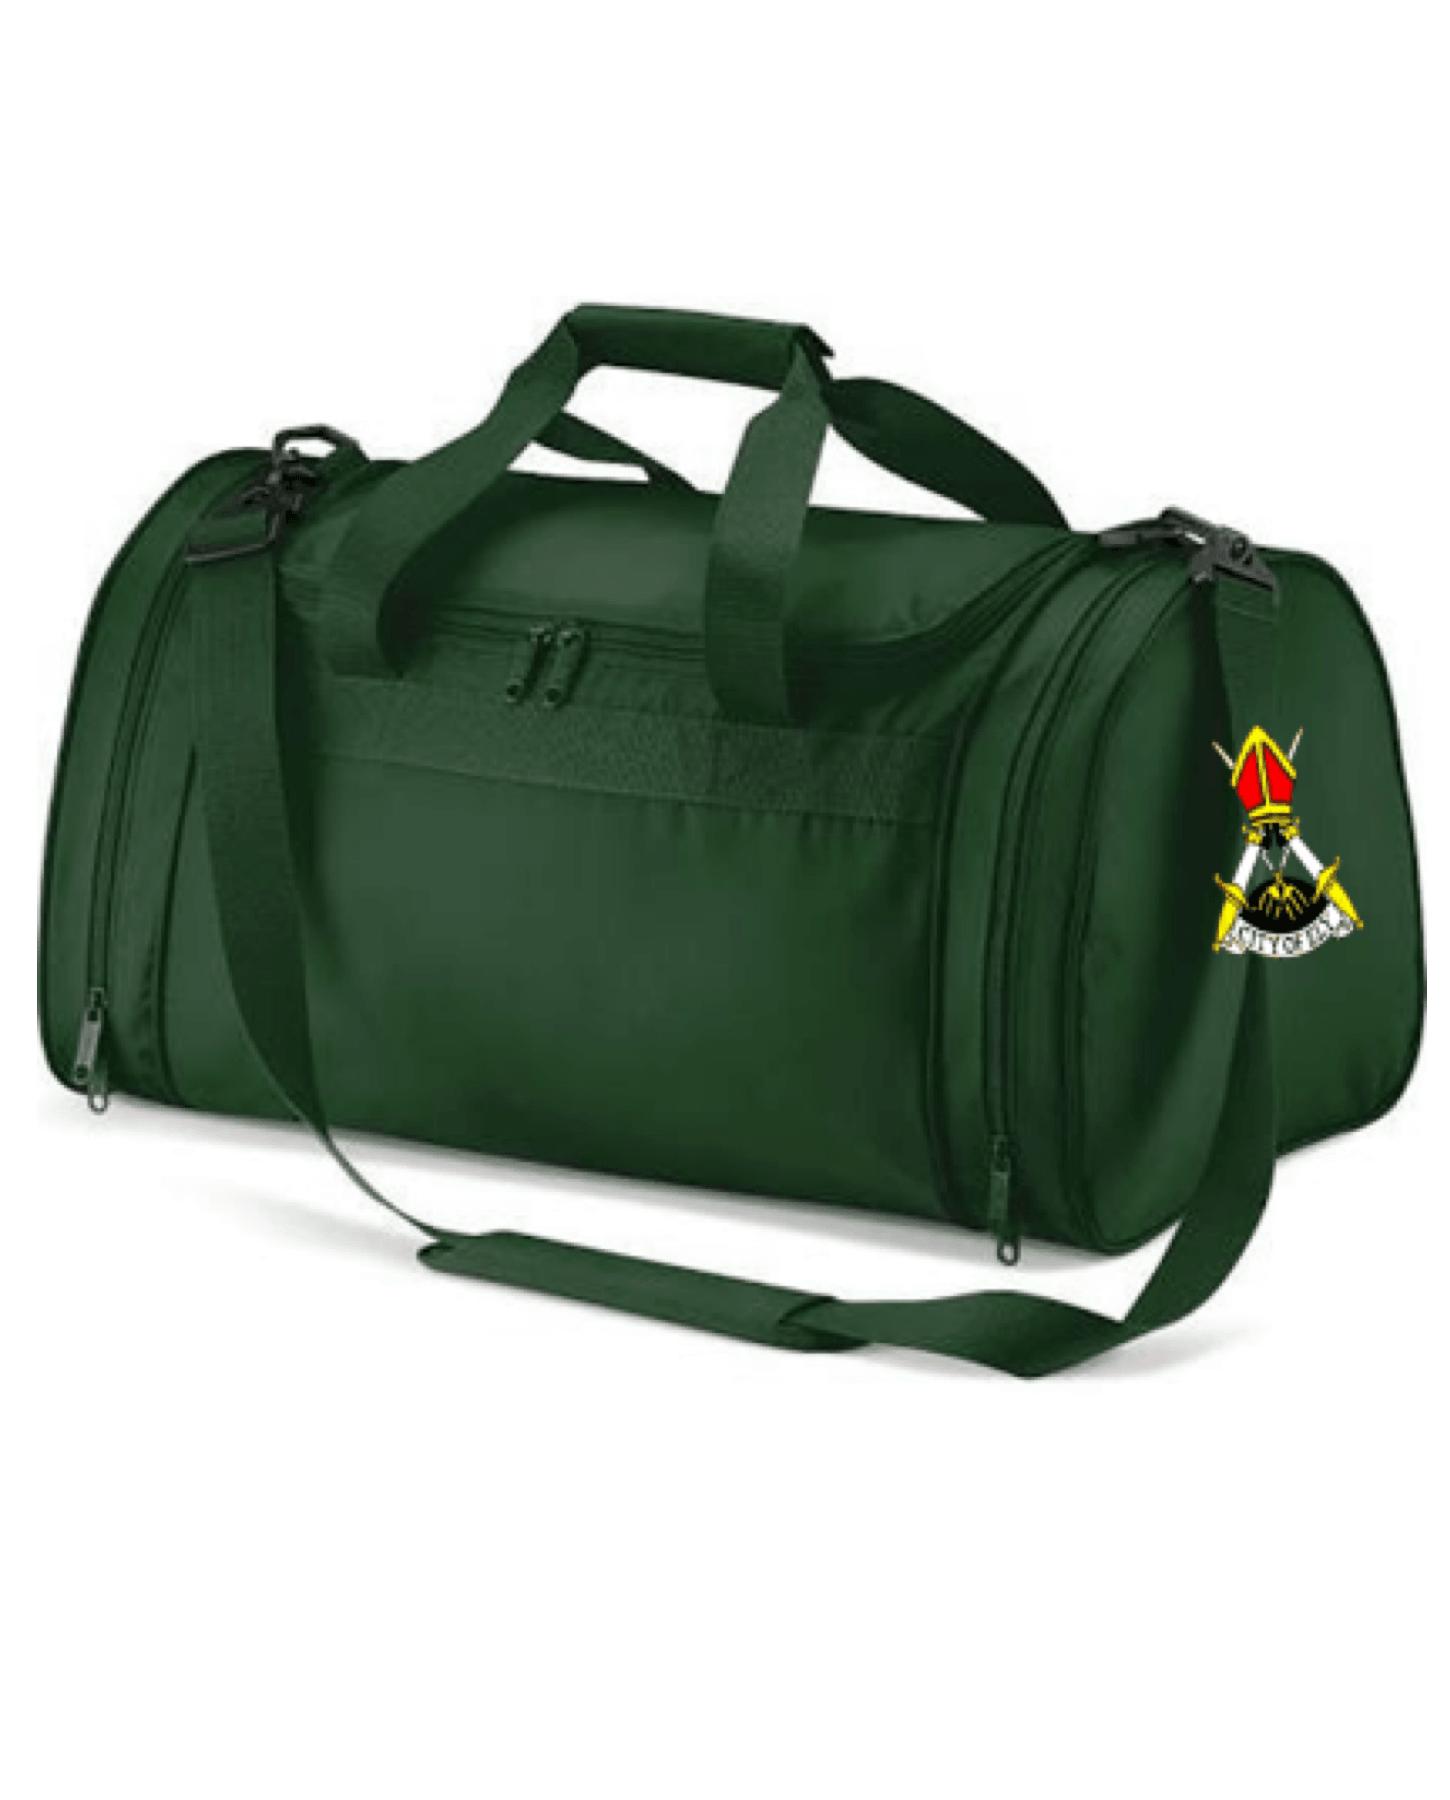 Ely City Hockey Club Kit Bag